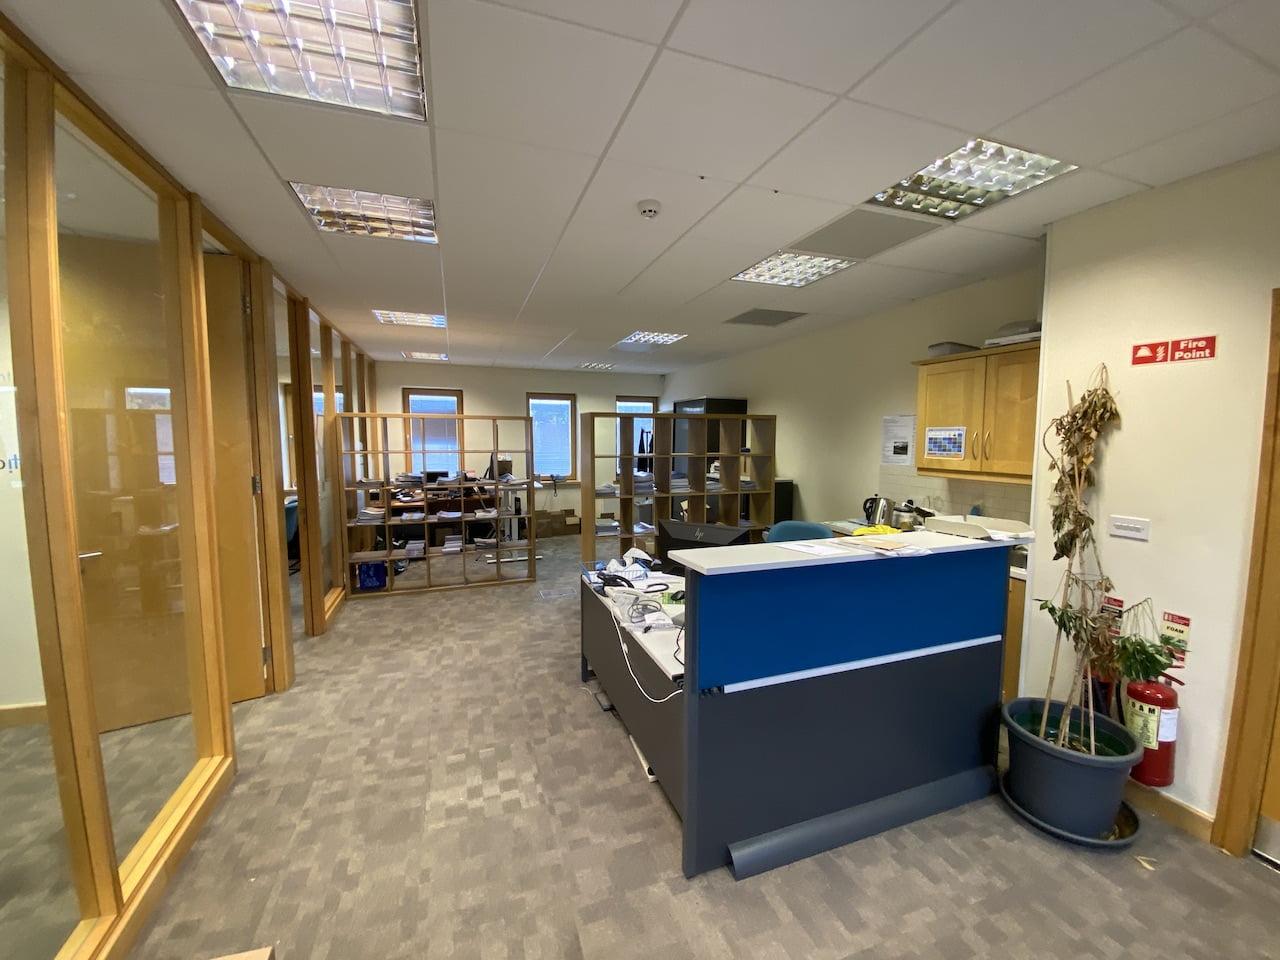 TO LET – Office in Monkstown, Co. Dublin A96 T924